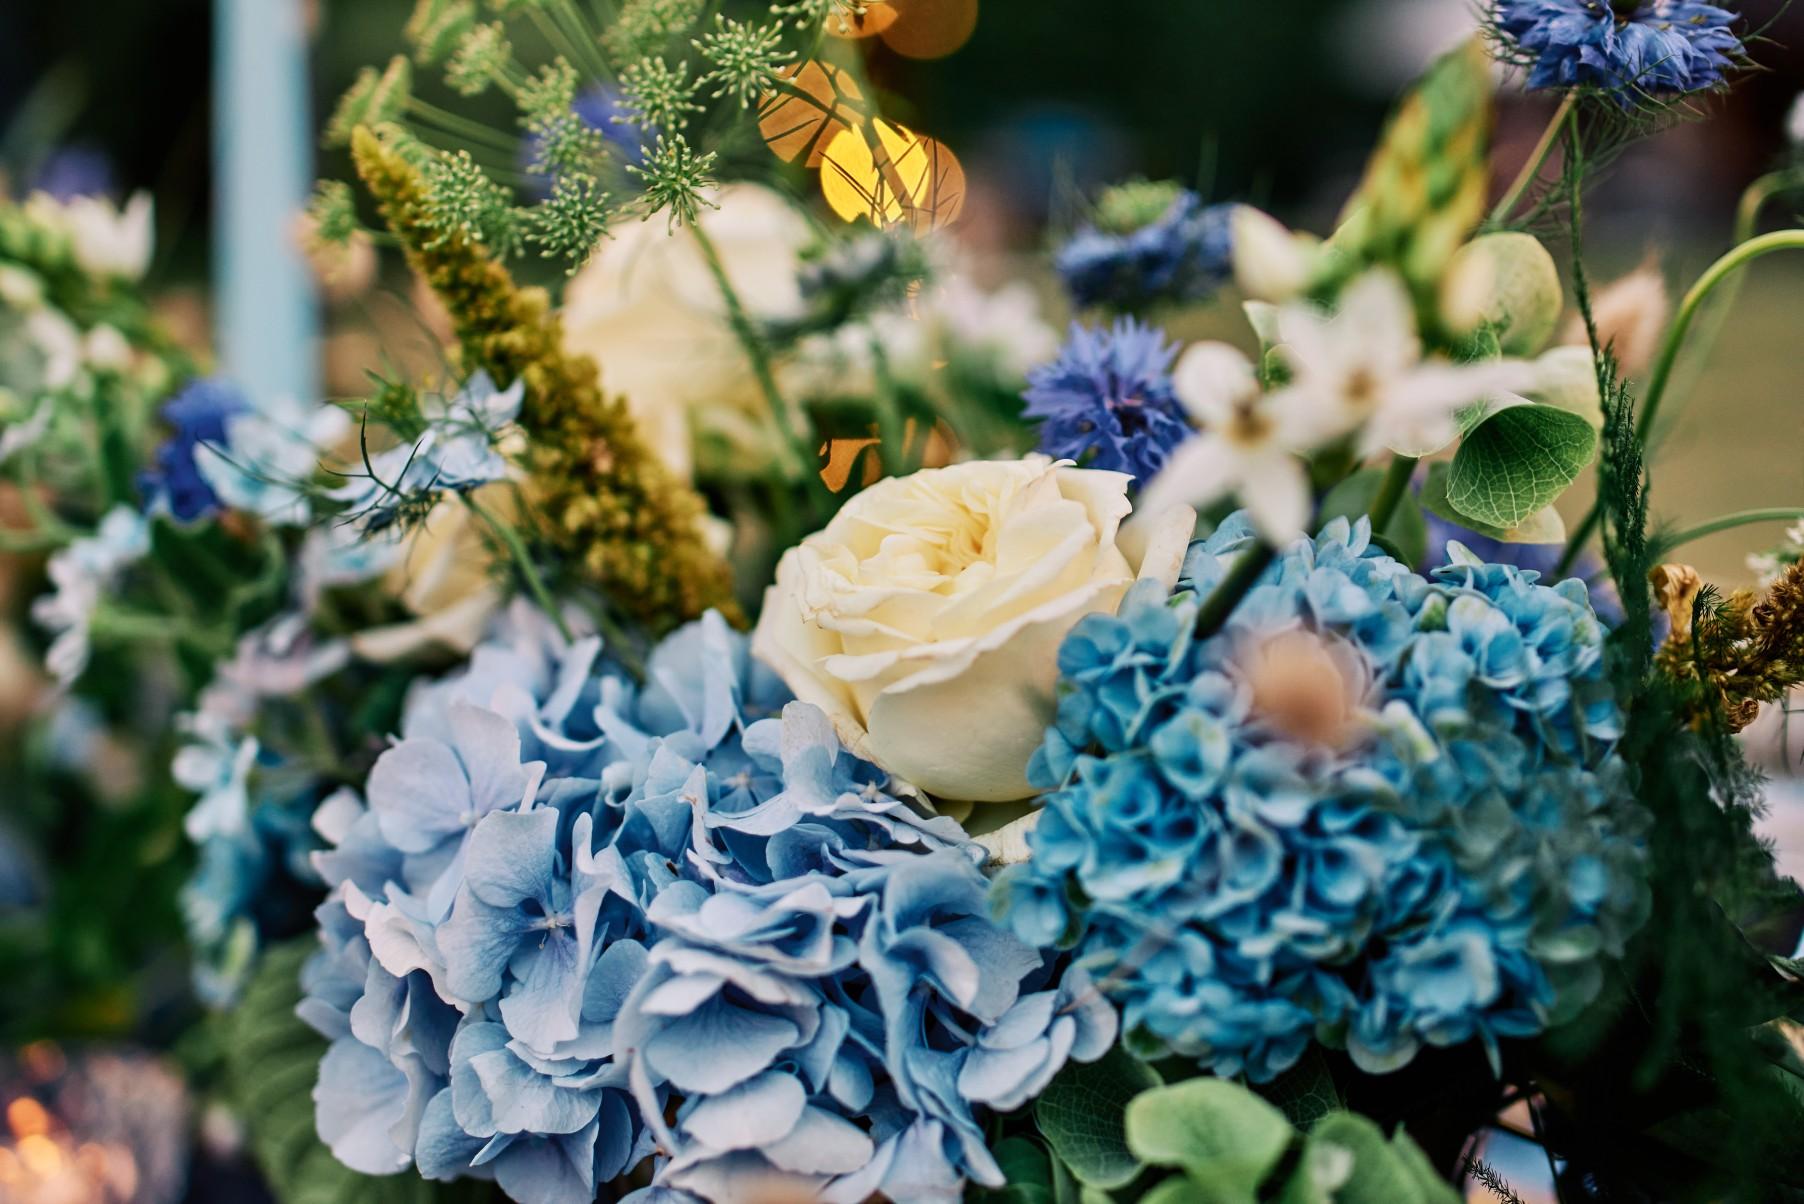 nhs wedding - paramedic wedding - blue and gold wedding - outdoor wedding - micro wedding - surprise wedding - blue and white wedding flowers